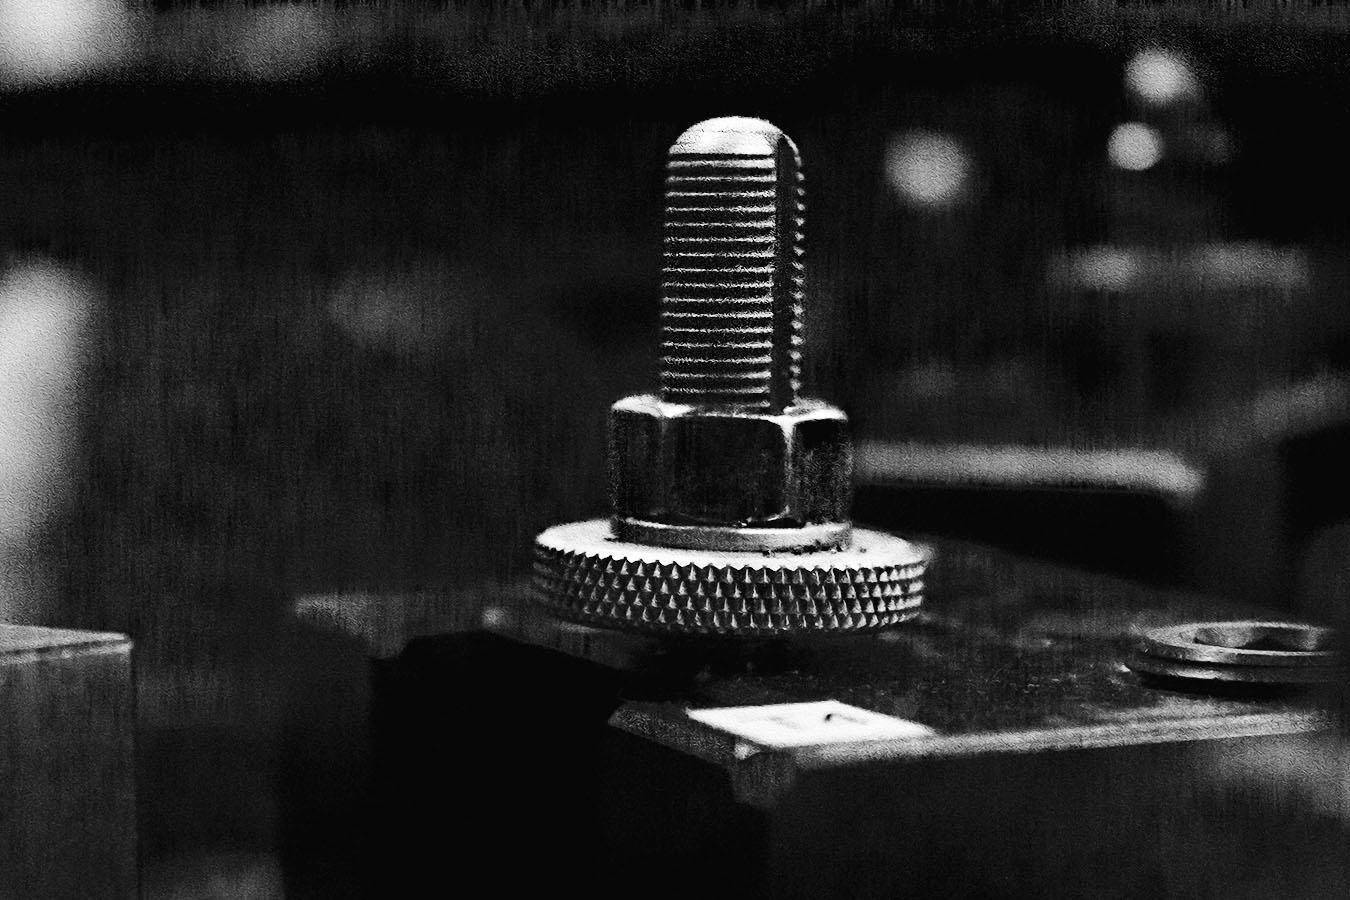 Alberto_Jimenez_Tool_clamp_partingTool_blur_background